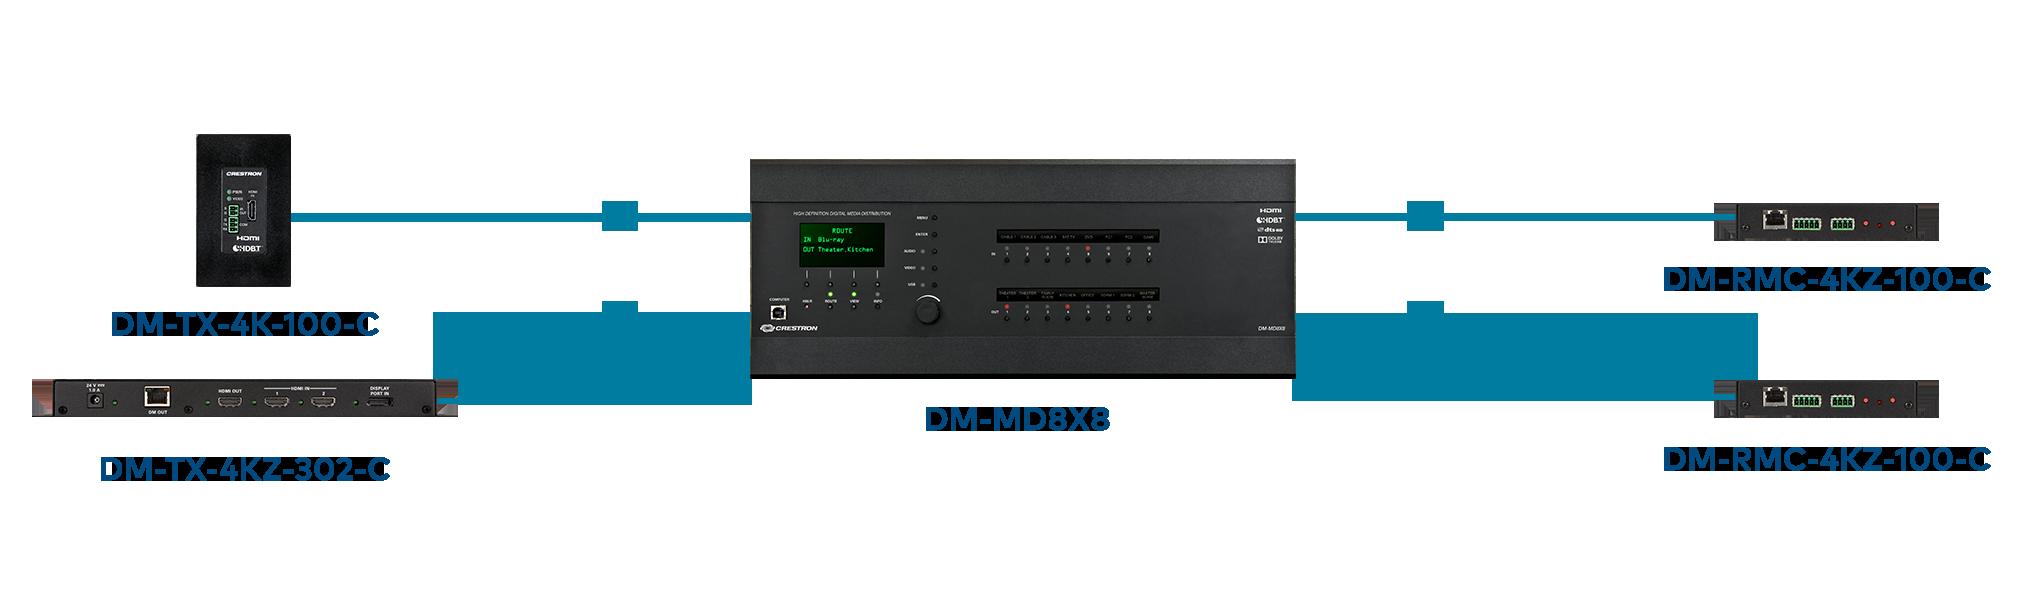 DigitalMedia Matrix Switchers [Crestron Electronics, Inc ]